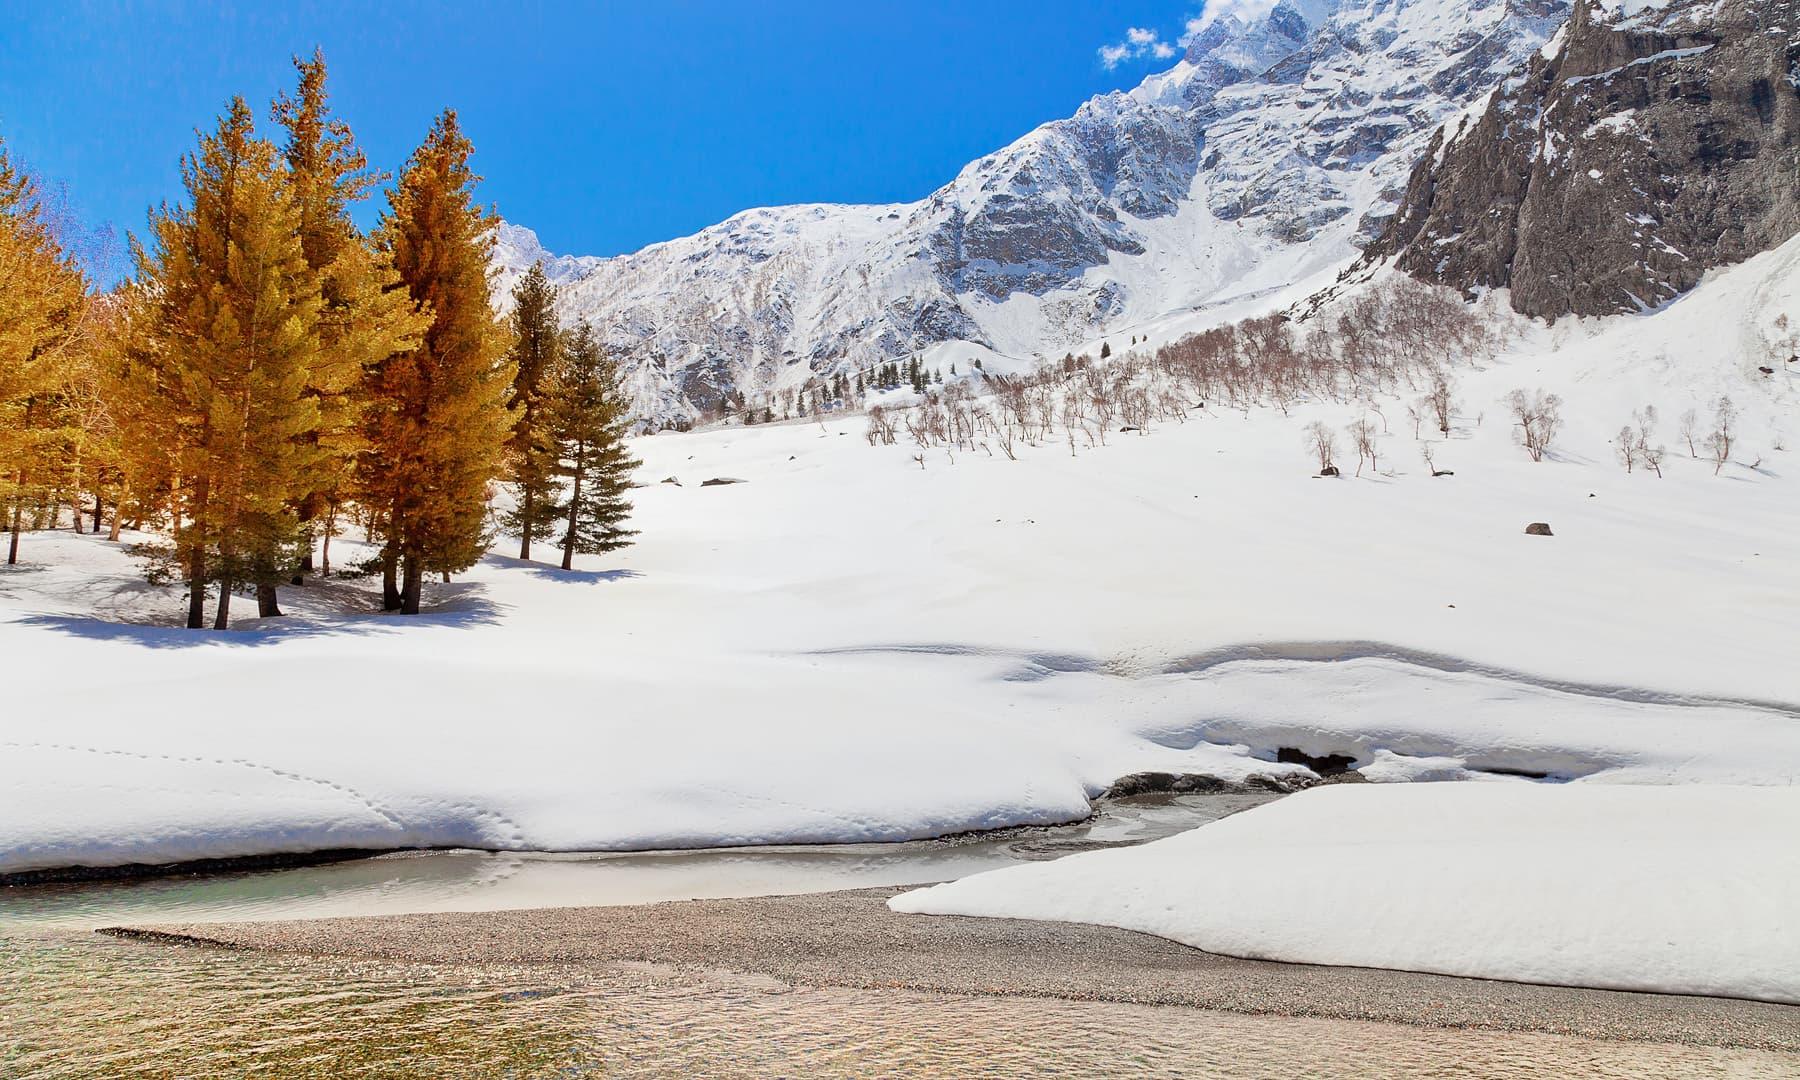 Naltar in winter. — Syed Mehdi Bukhari